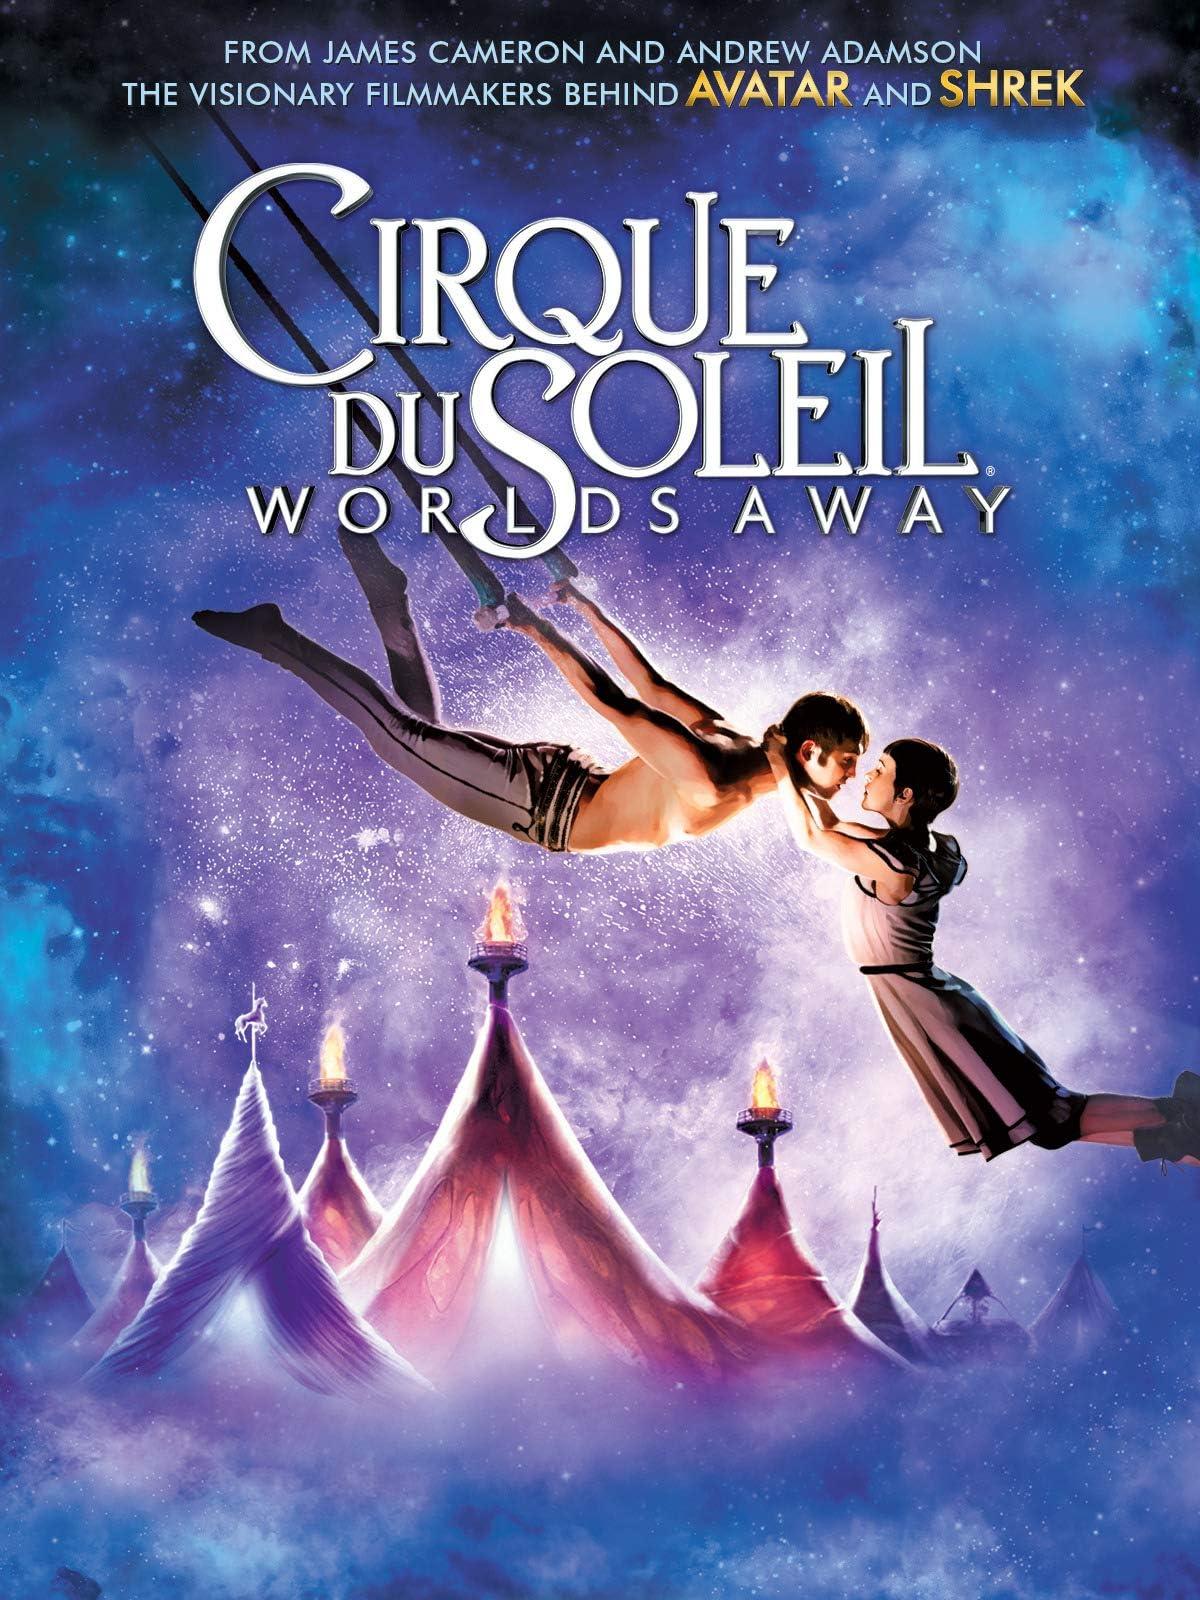 Trampoline de cirque